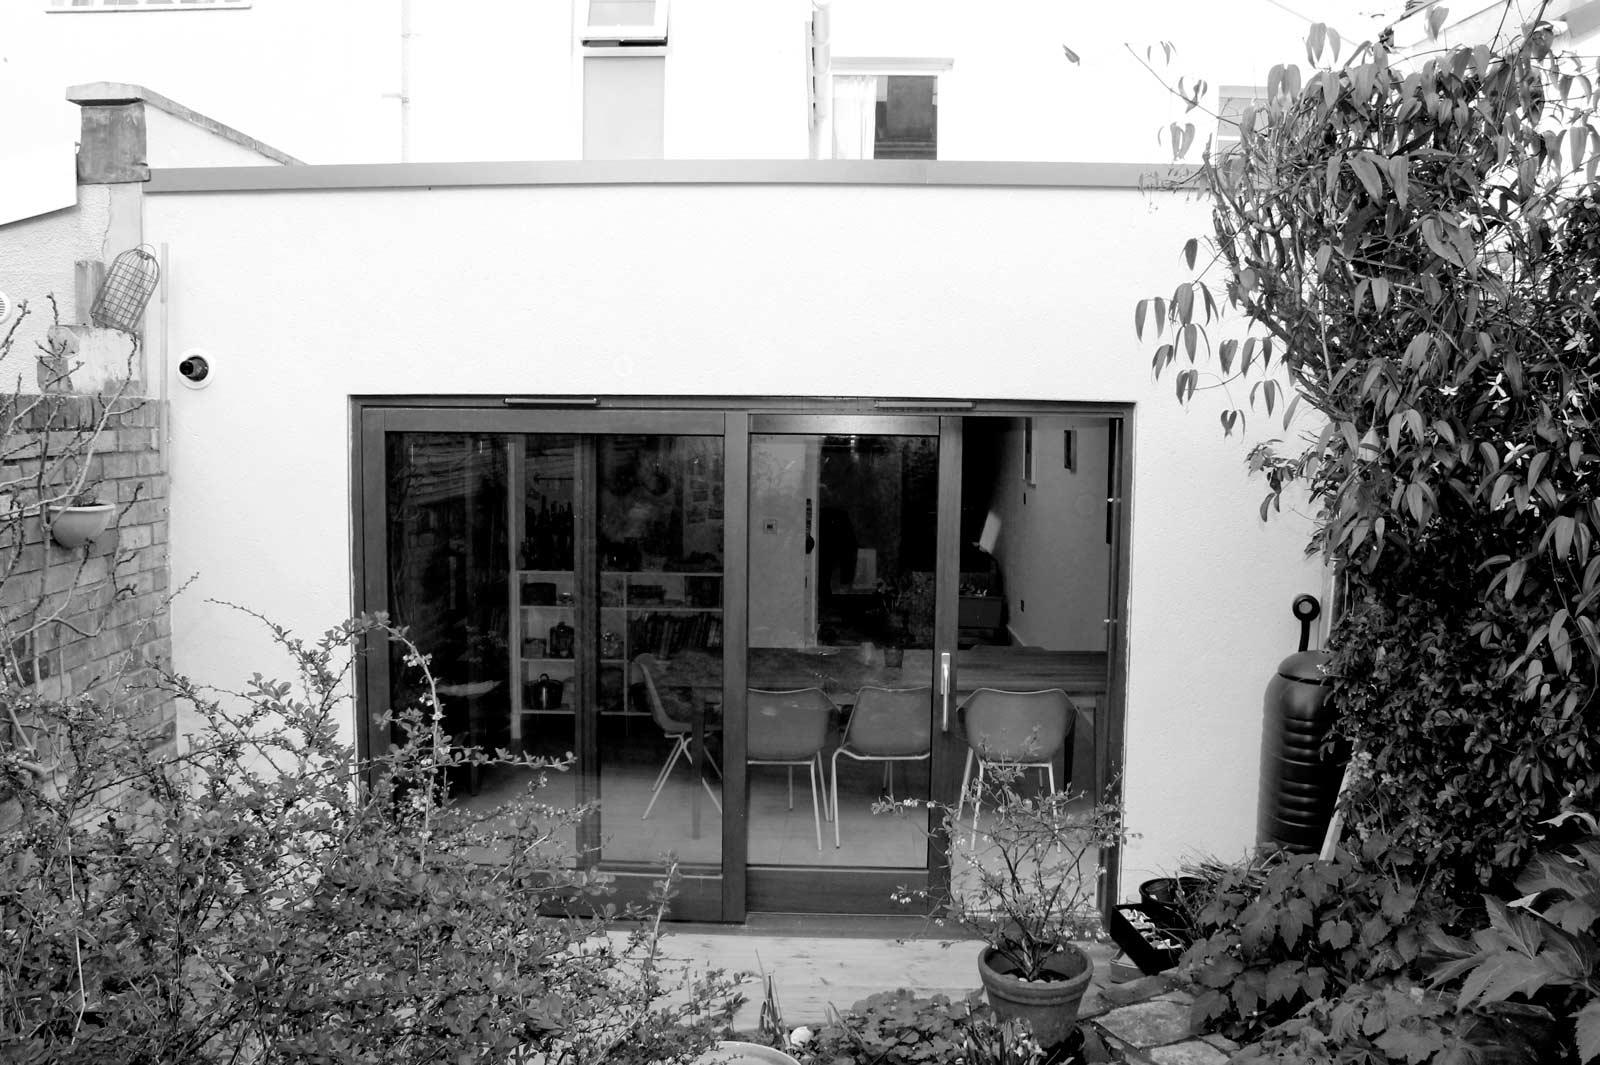 House 1 Redland, Bristol